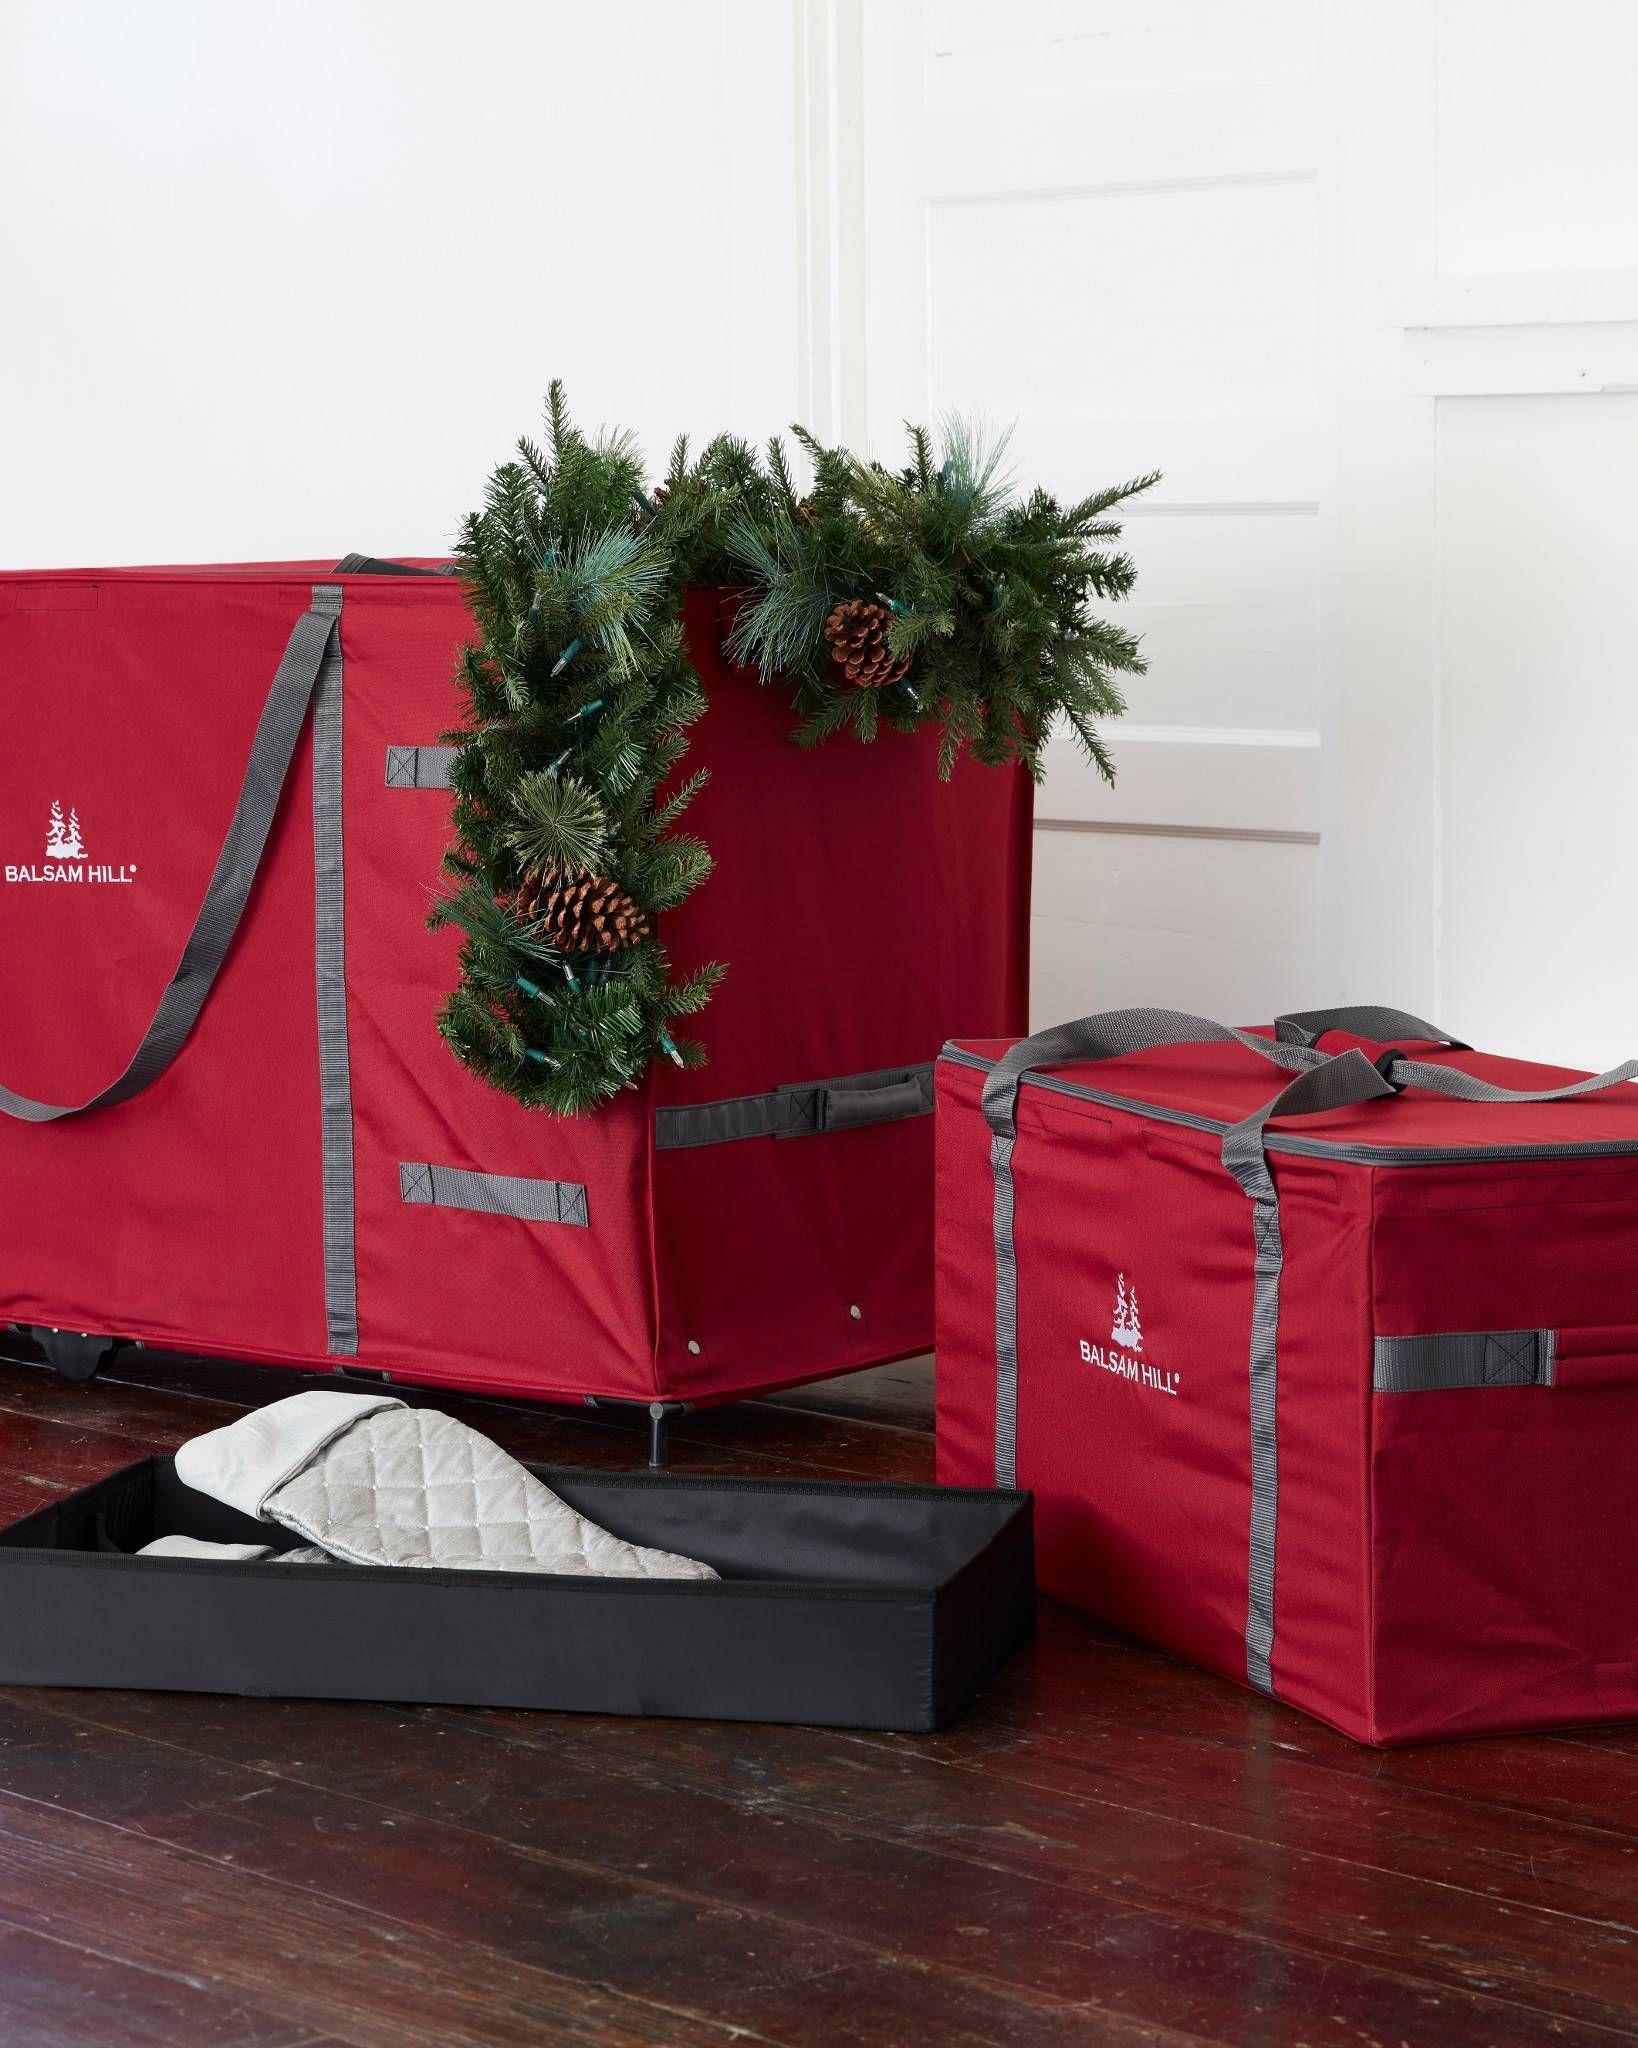 Multi Purpose Greenery Bag Balsam Hill Organized Christmas Decorations Balsam Hill Cosy Christmas